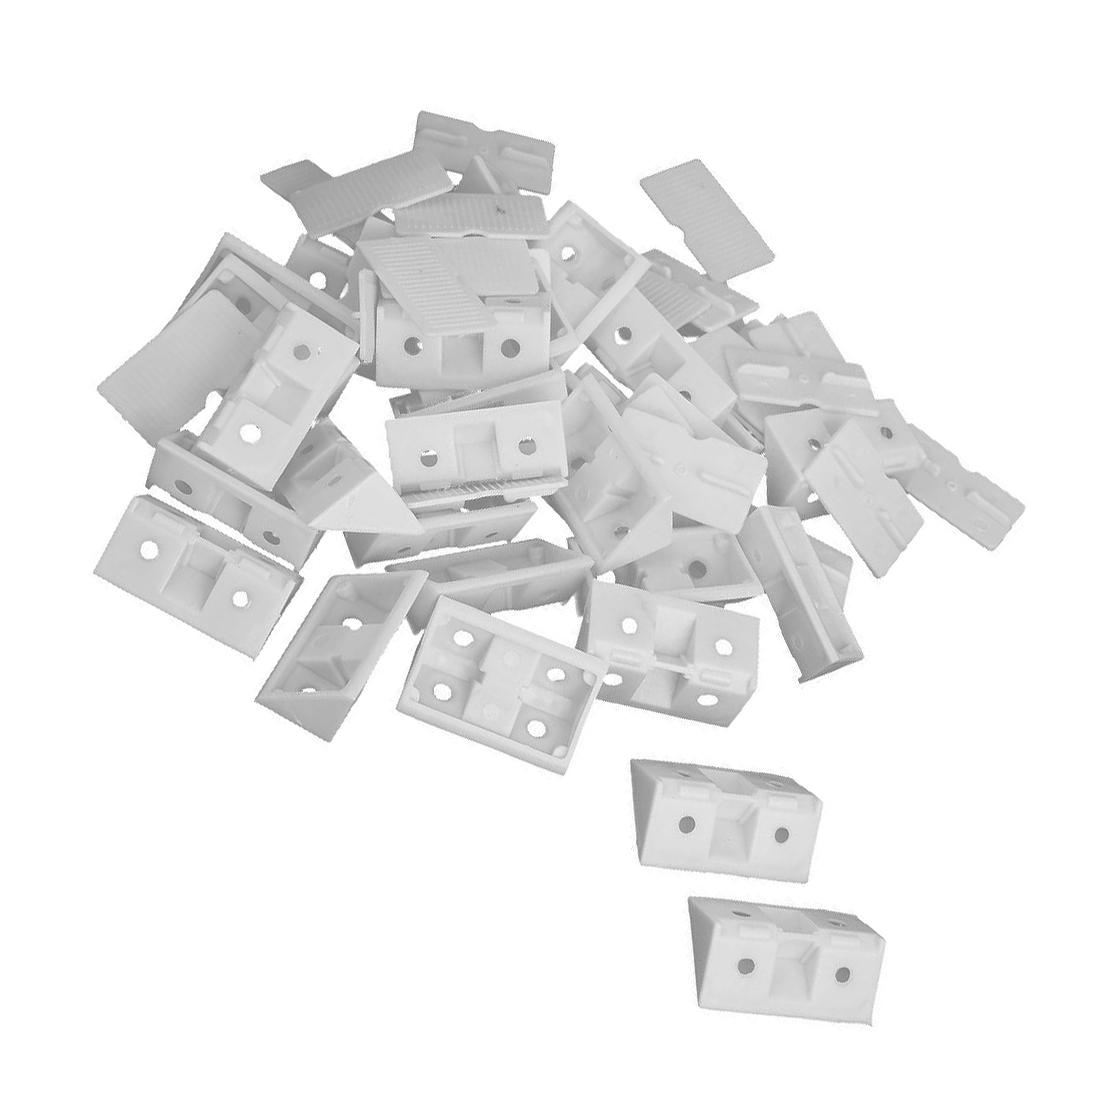 30pcs Shelf Cabinet 90 Degree Plastic Corner Braces Angle Brackets ...